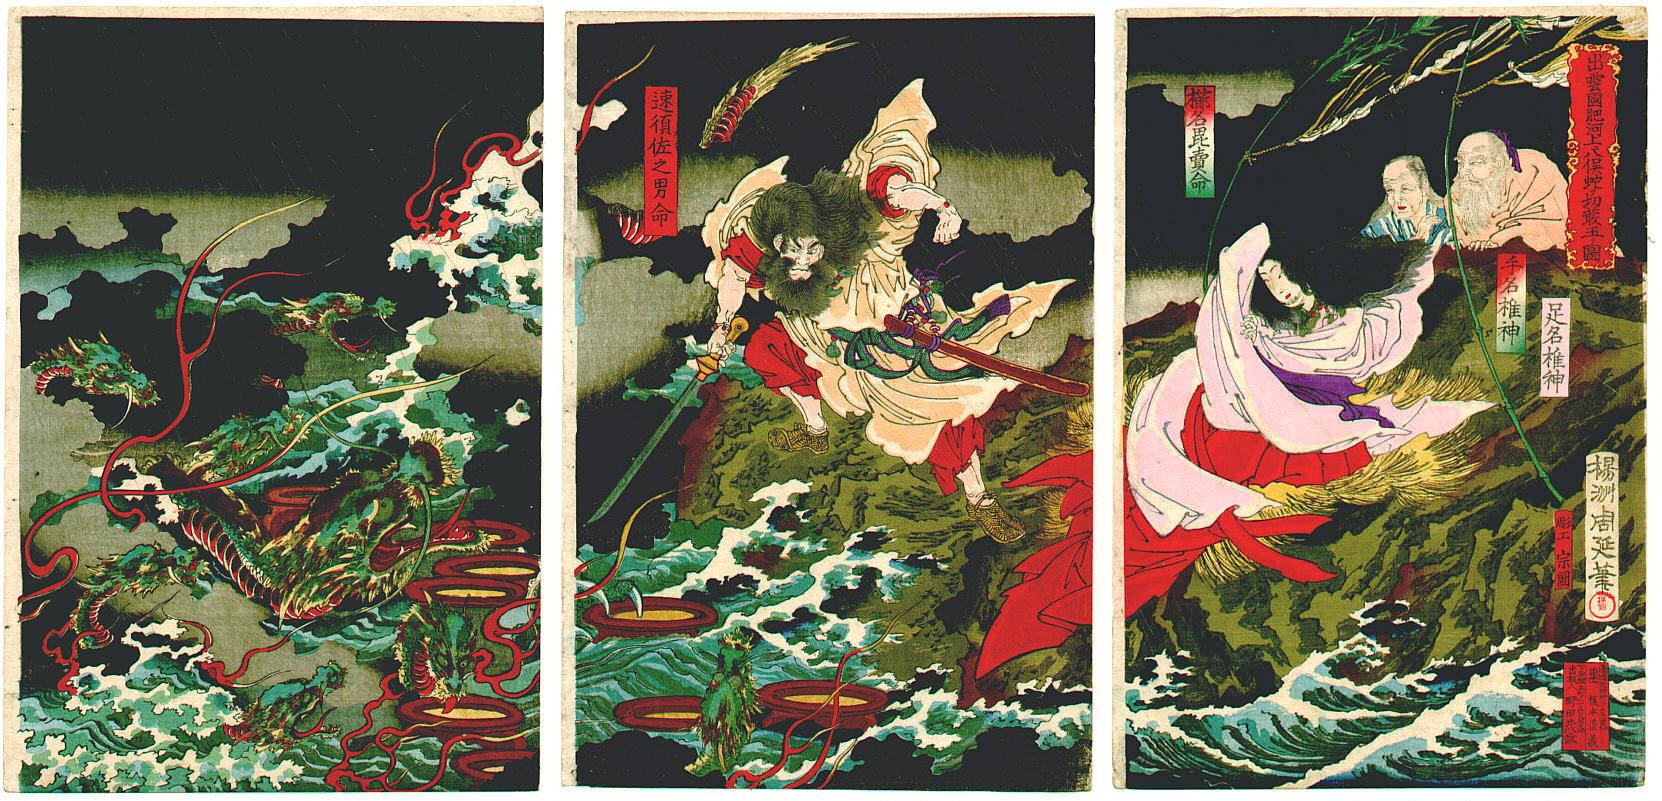 Windgott Susanoo kämpft gegen den achtköpfigen Drachen Yamata no Orochi. (Foto: Toyohara Chikanobu auf Wikimedia Commons https://commons.wikimedia.org/w/index.php?curid=1355187 CC0 1.0)